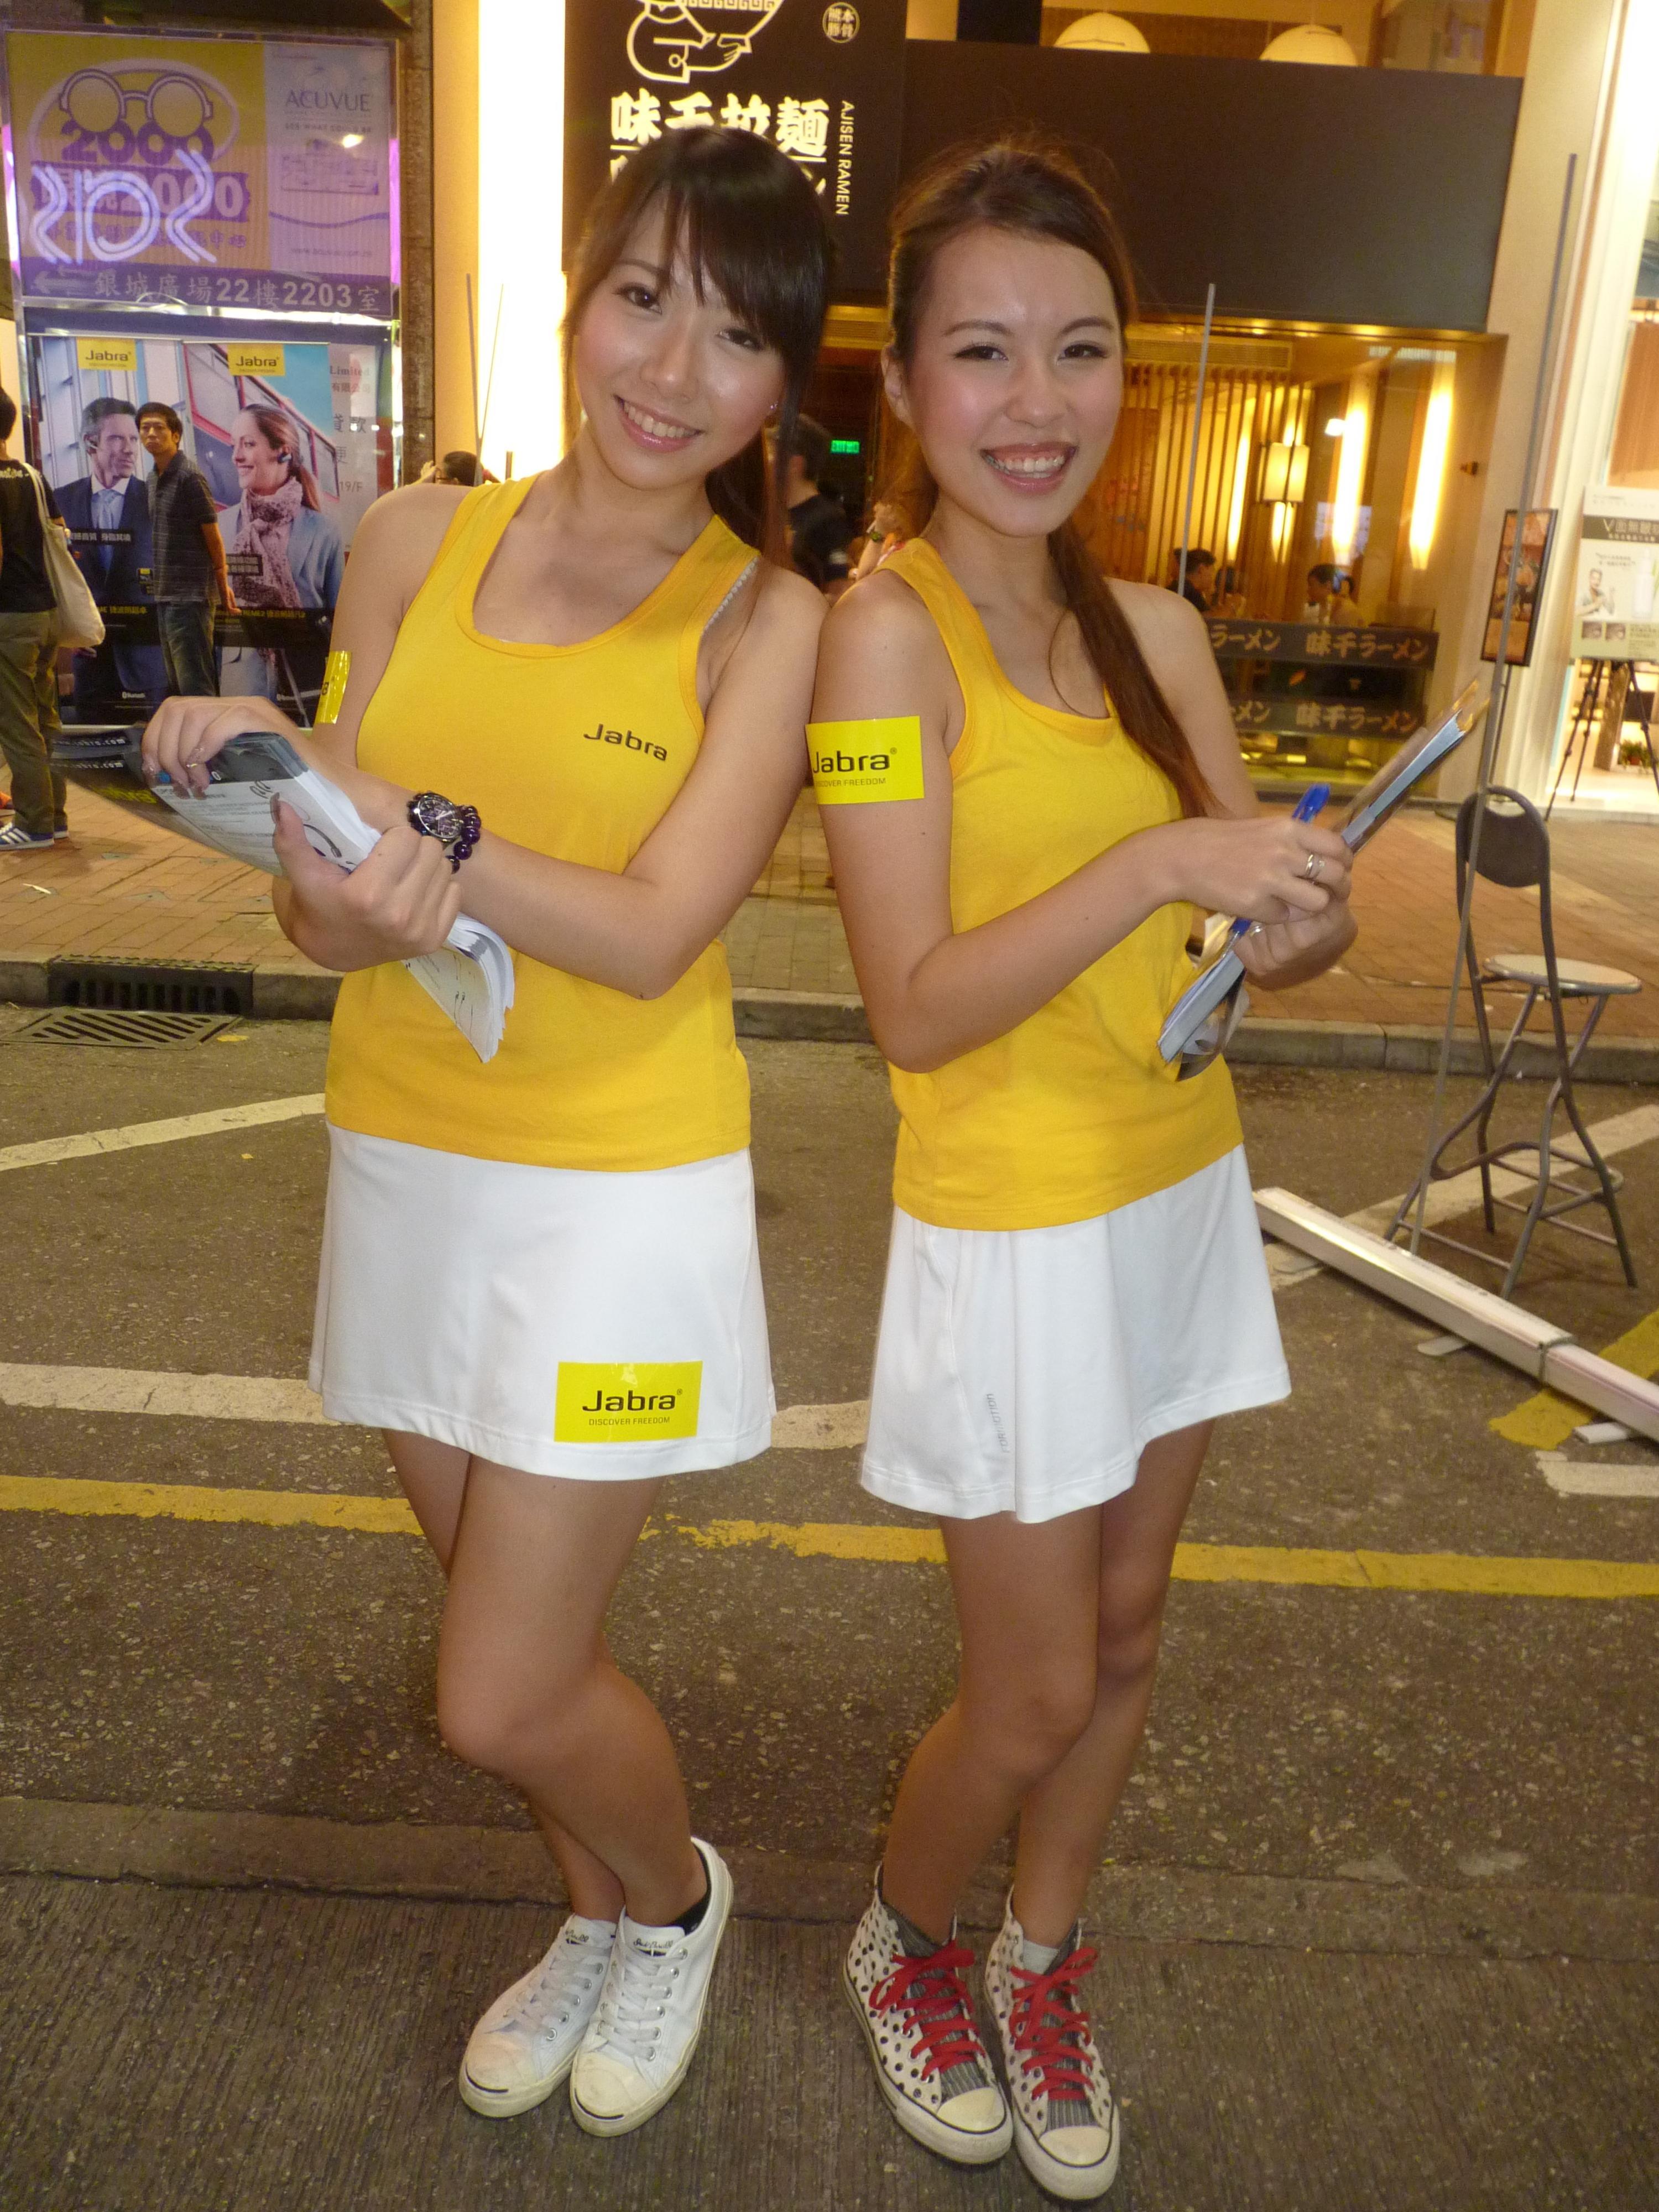 skirt escort service macau